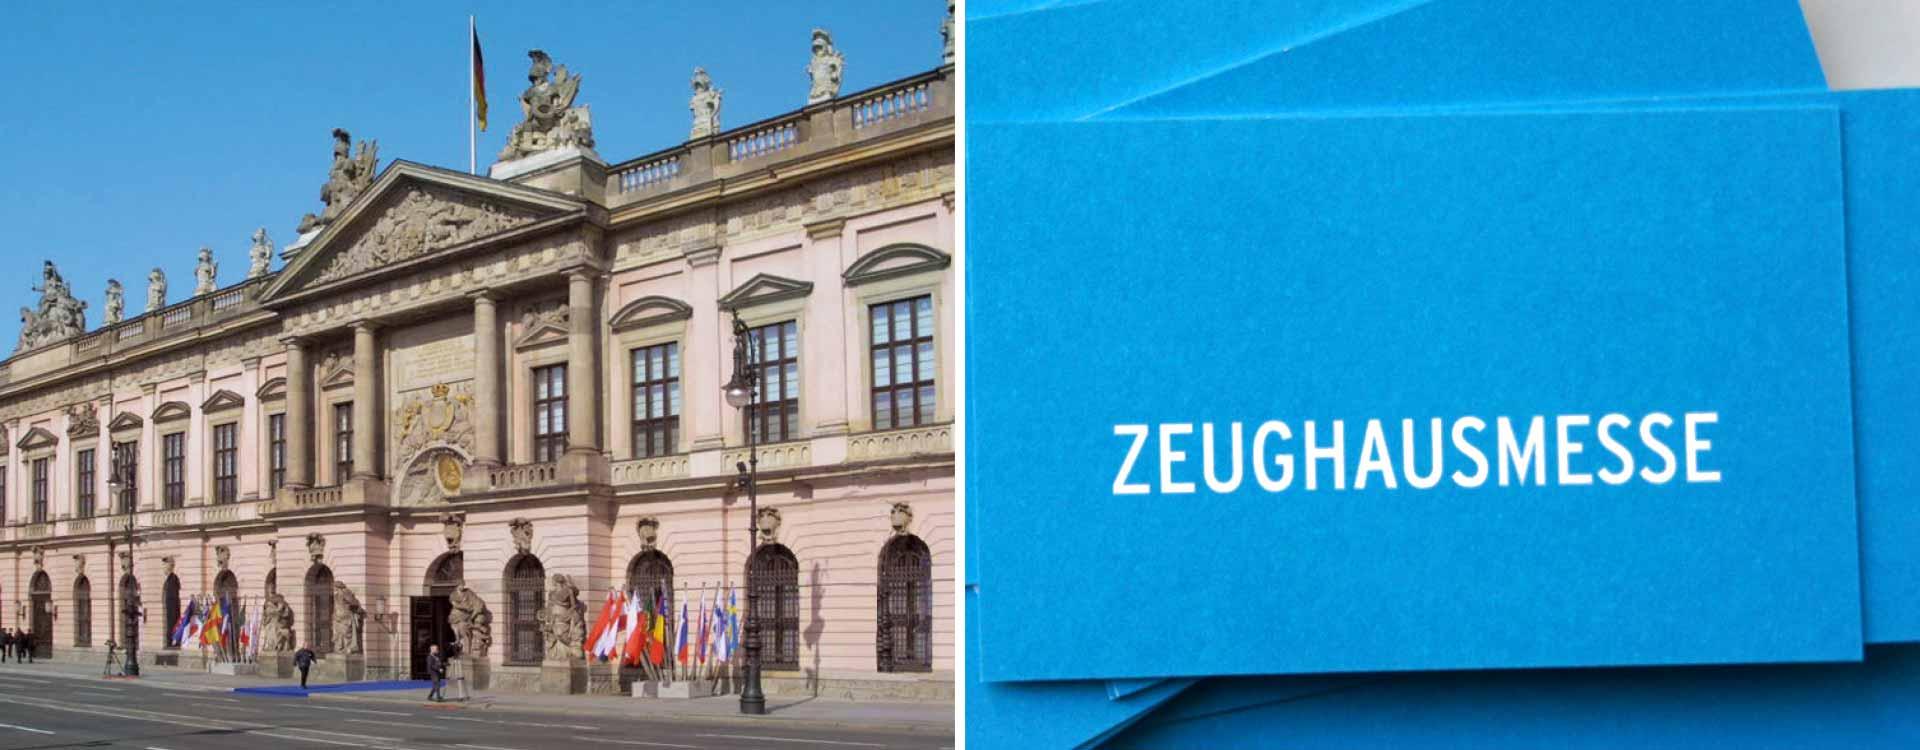 Front view of Zeughaus Berlin, business card of Zeughausmesse; Design: Kattrin Richter | Graphic Design Studio